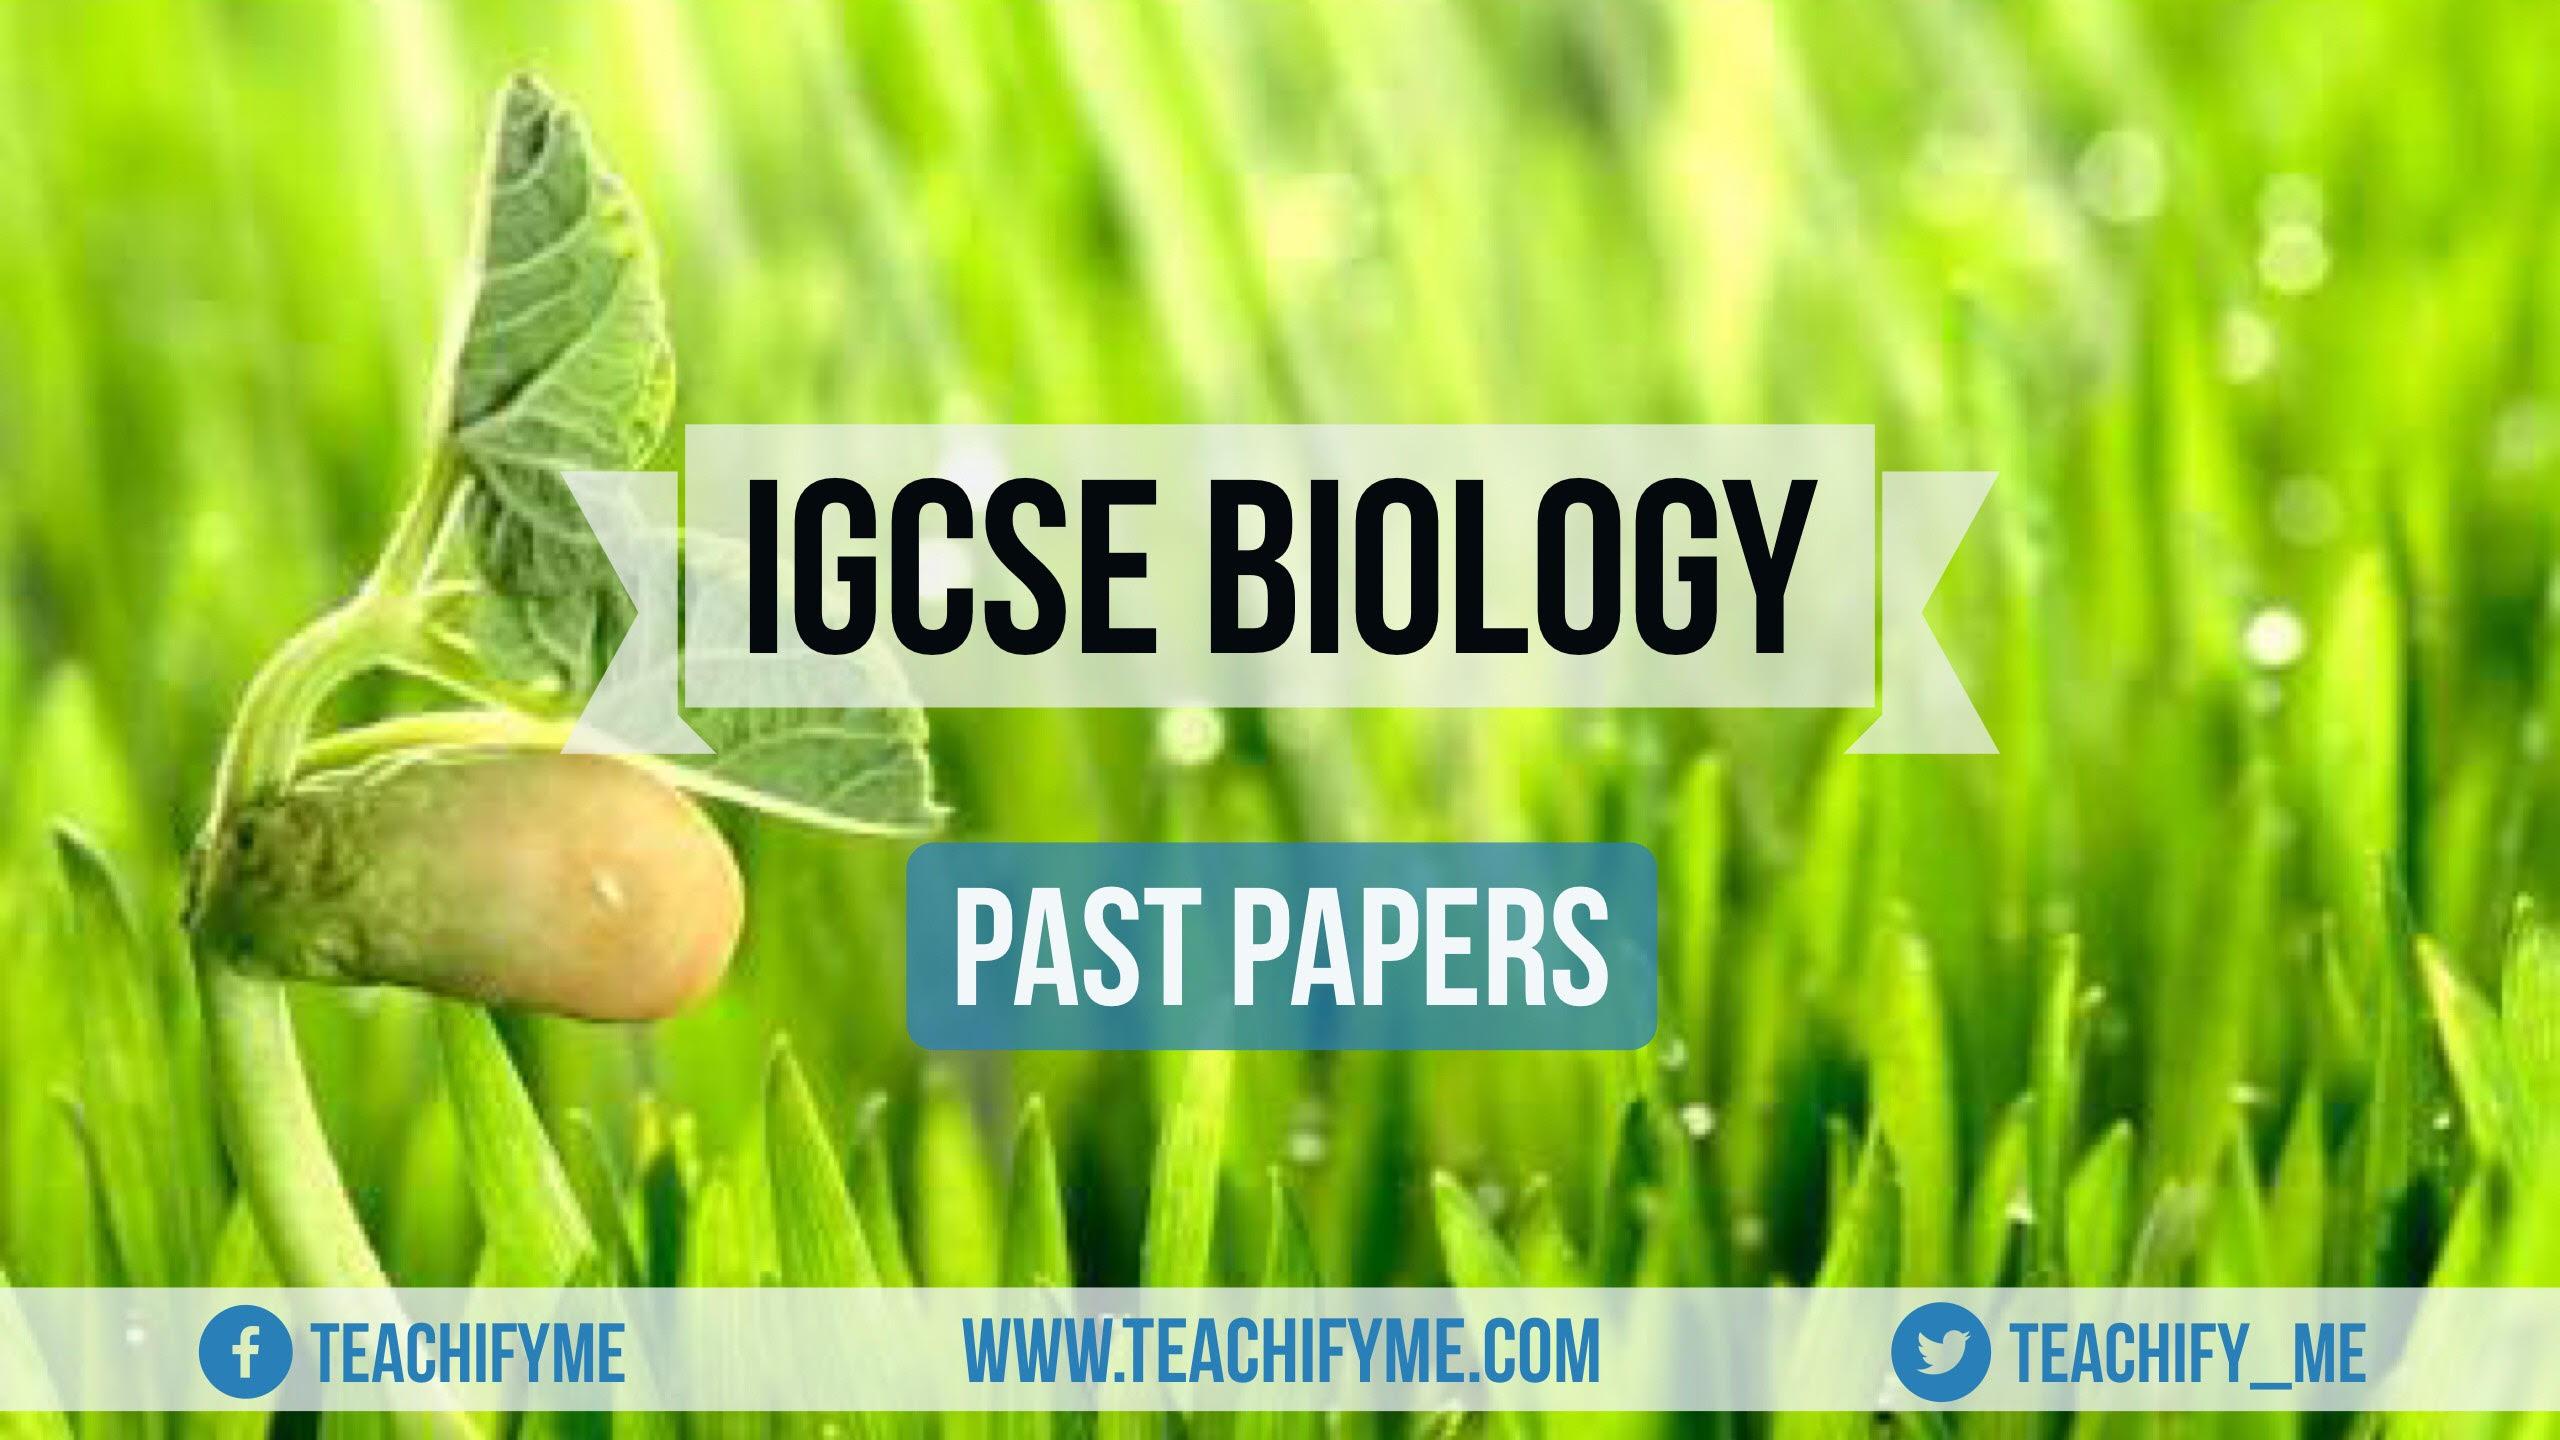 Igcse Biology Past Papers Pdf